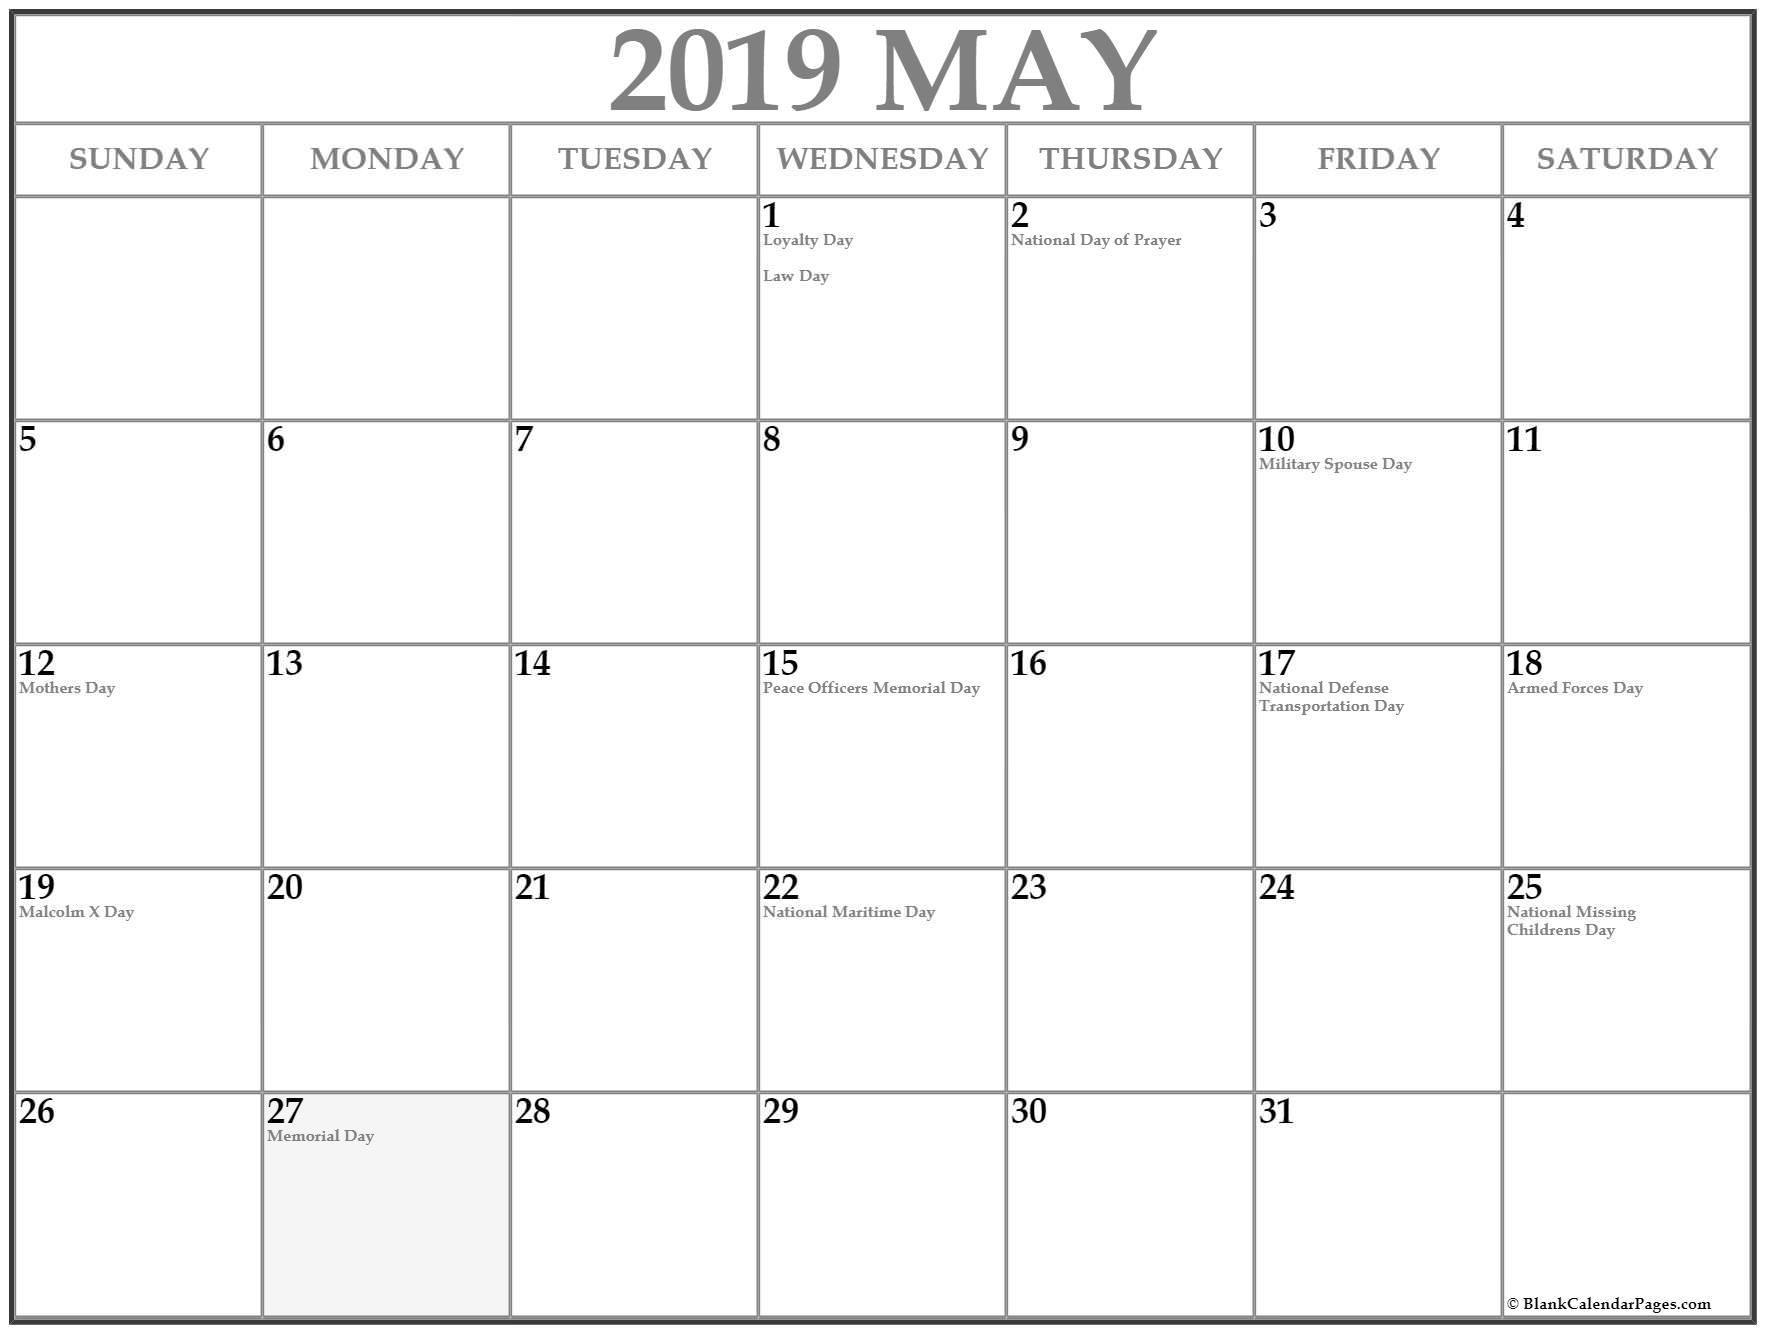 May 2019 Calendar Printable With Holidays